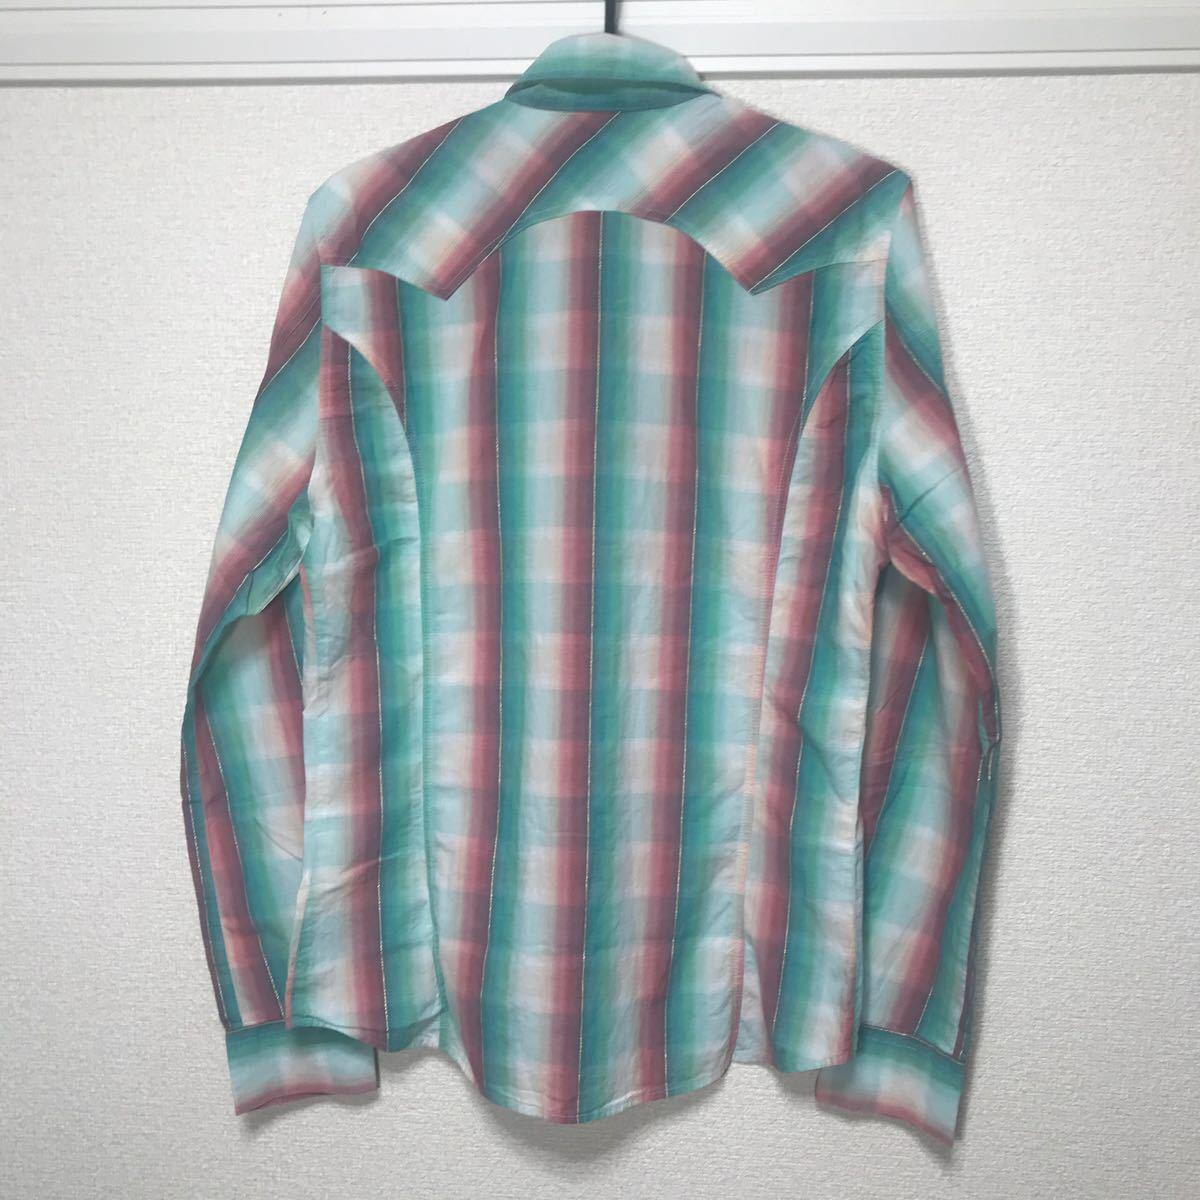 DIESEL ディーゼル シャツ 長袖 トップス スナップボタン サイズS